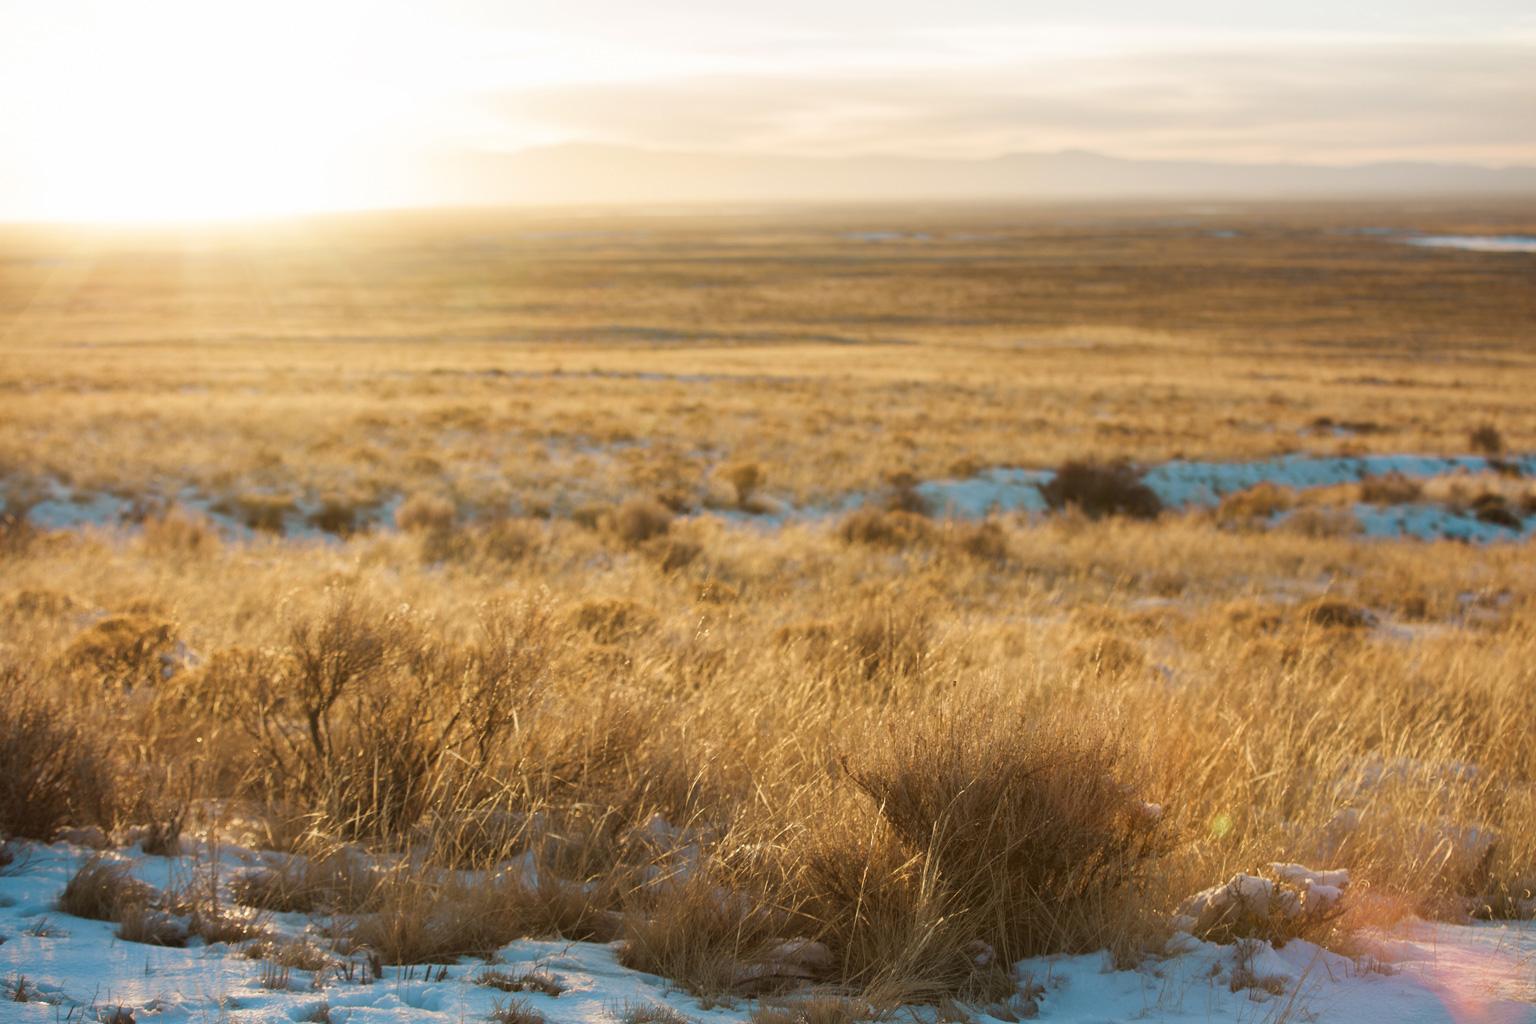 CindyGiovagnoli_Great_Sand_Dunes_National_Park_NPS_Colorado_roadtrip-014.jpg